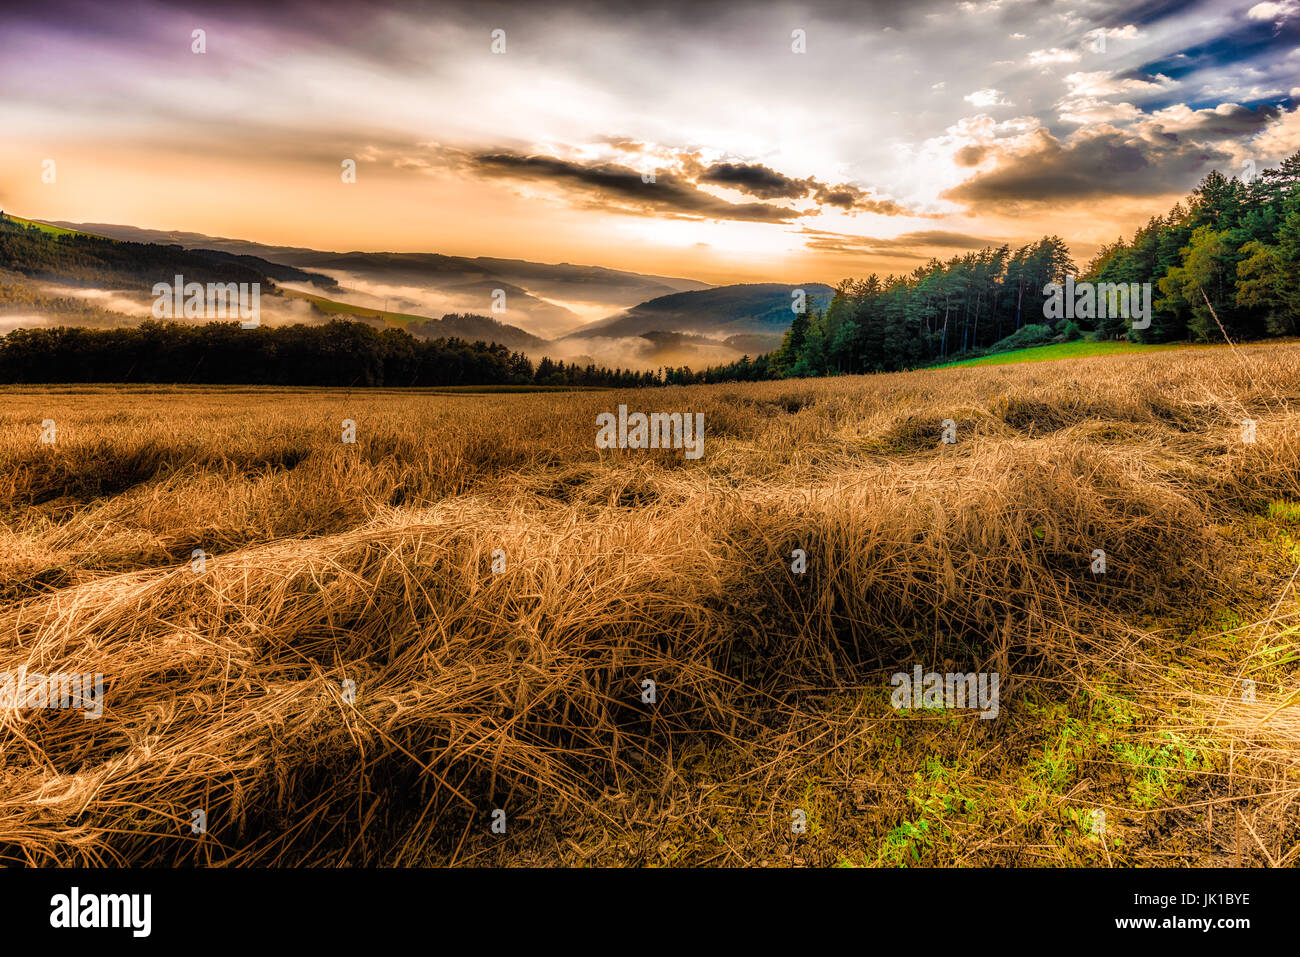 Neblig Farbe Panorama malerische goldenen Sonnenaufgang über Heu Felder, Täler, Hügel und Wald Stockbild